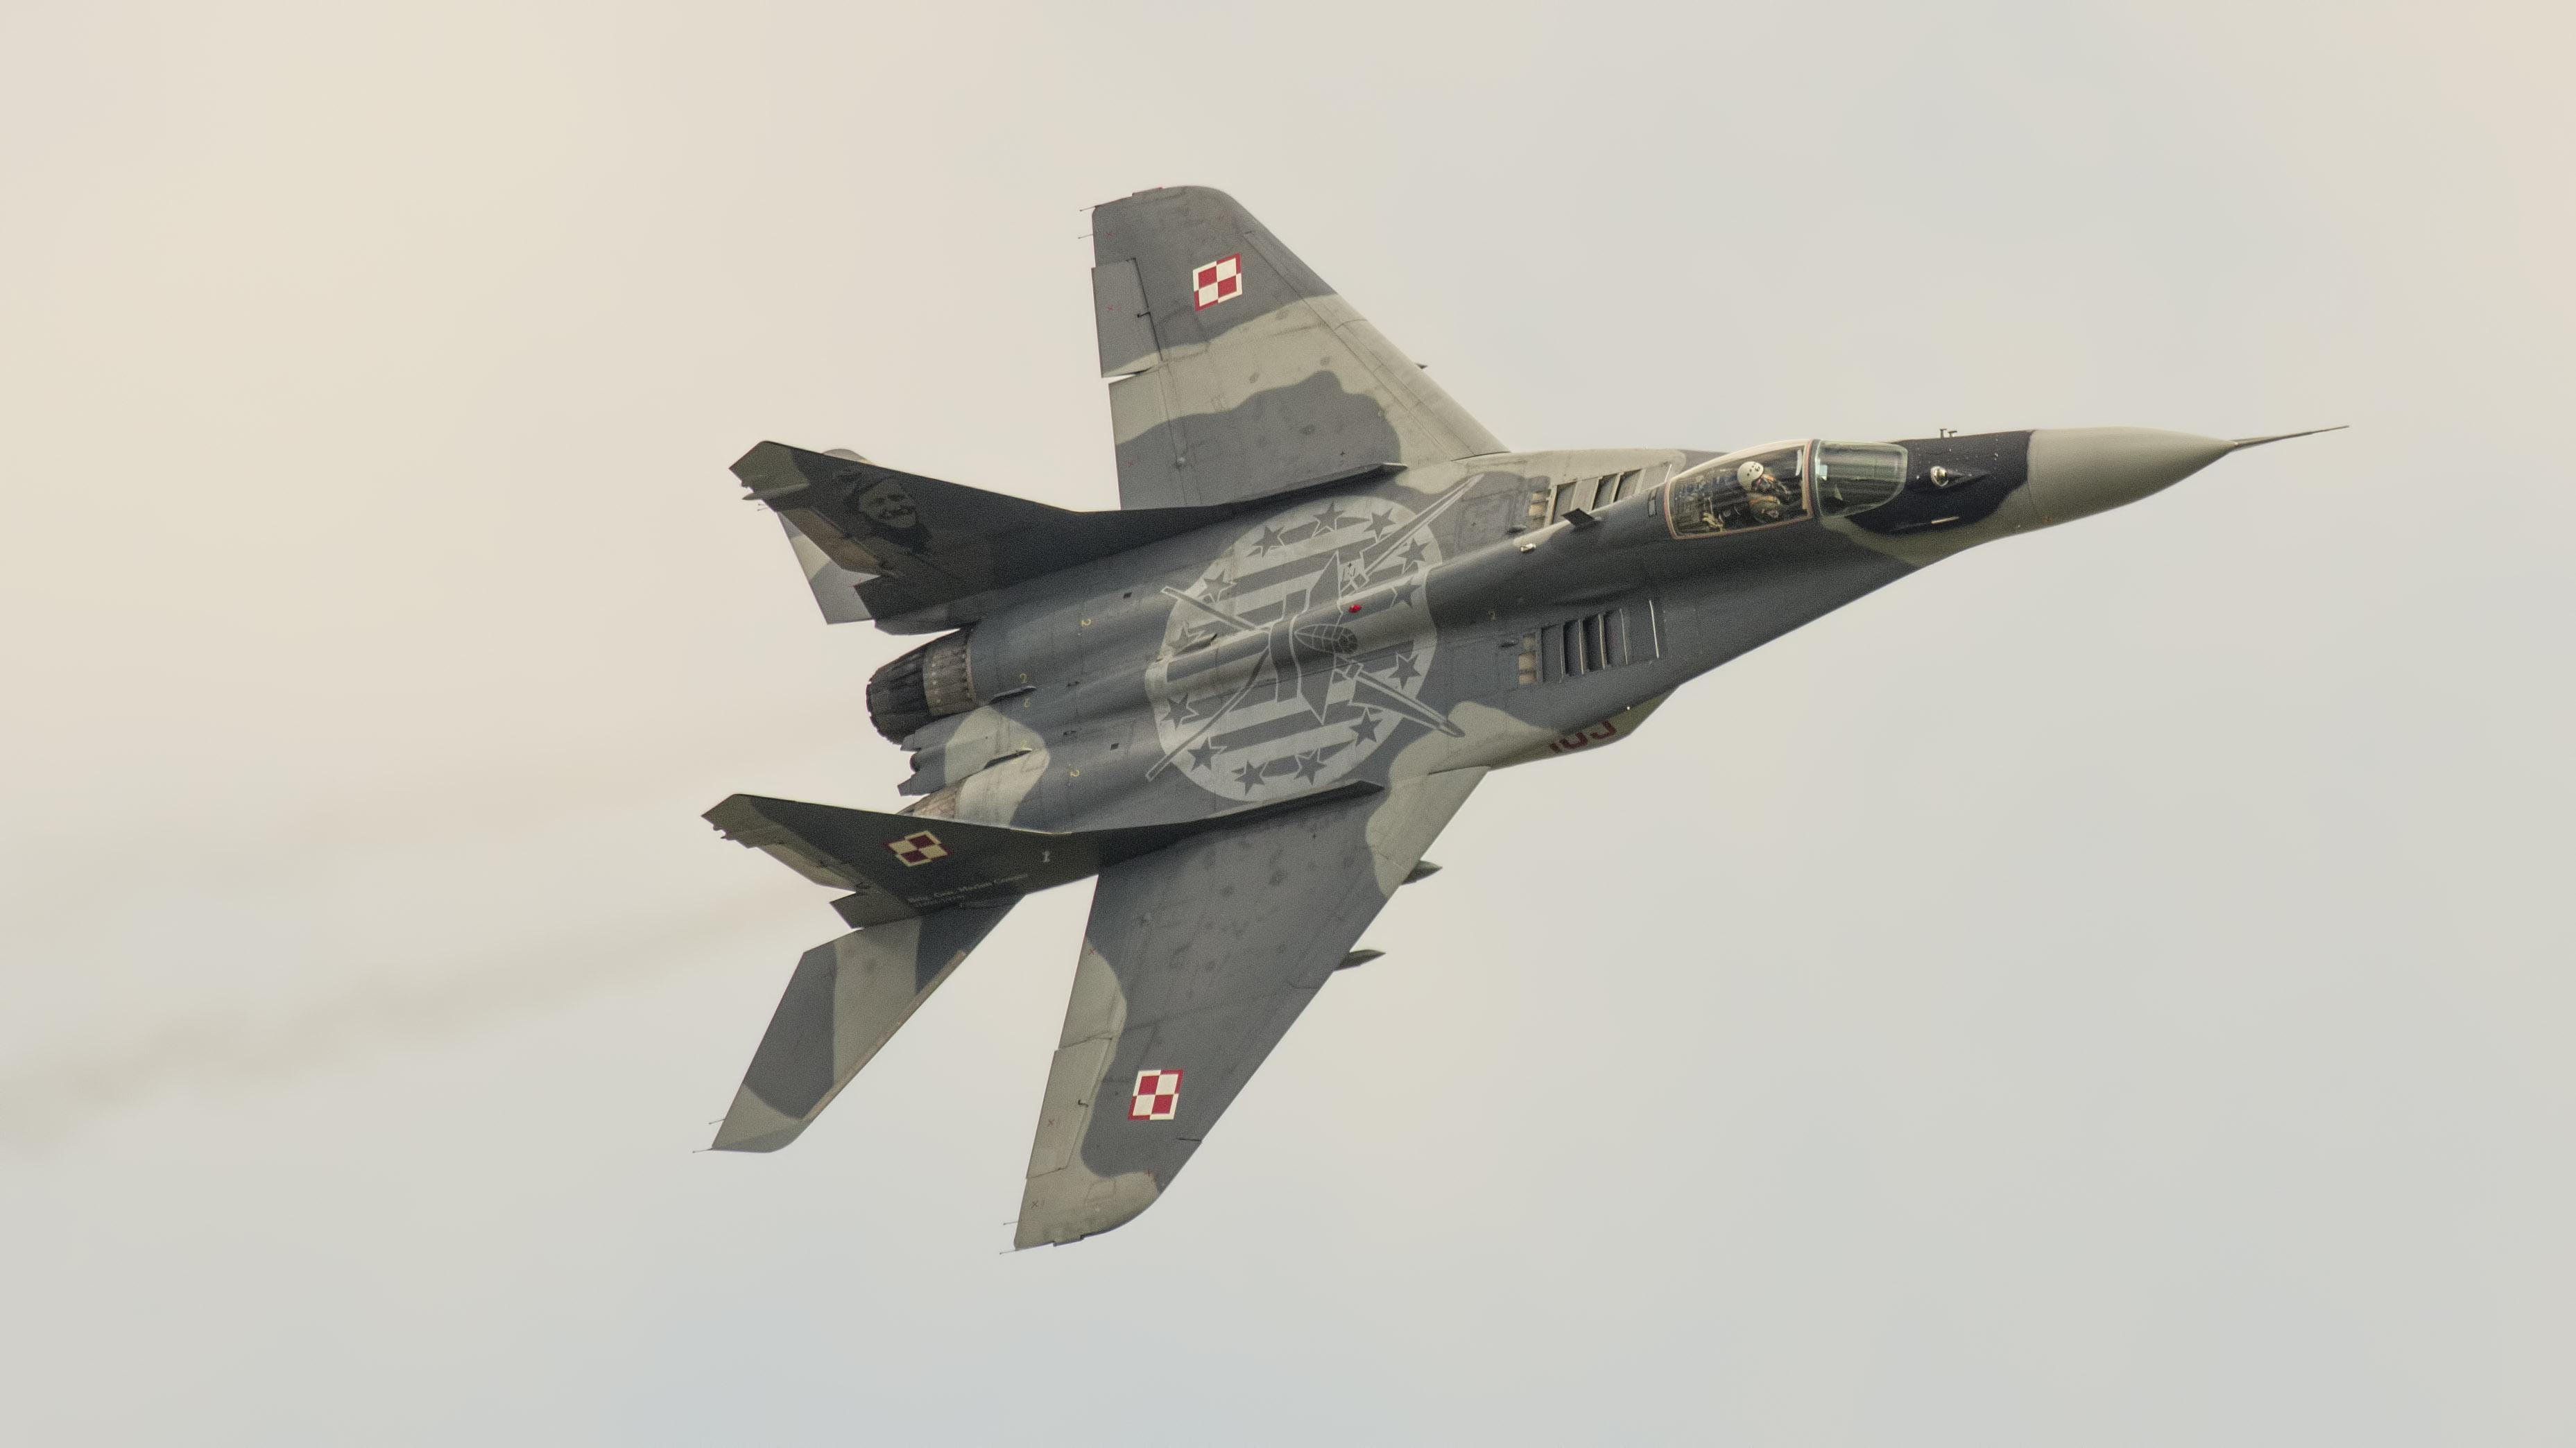 _IMG2074 Mikoyan-Gurevich MiG-29A 9-12A 105 Polish Air Force